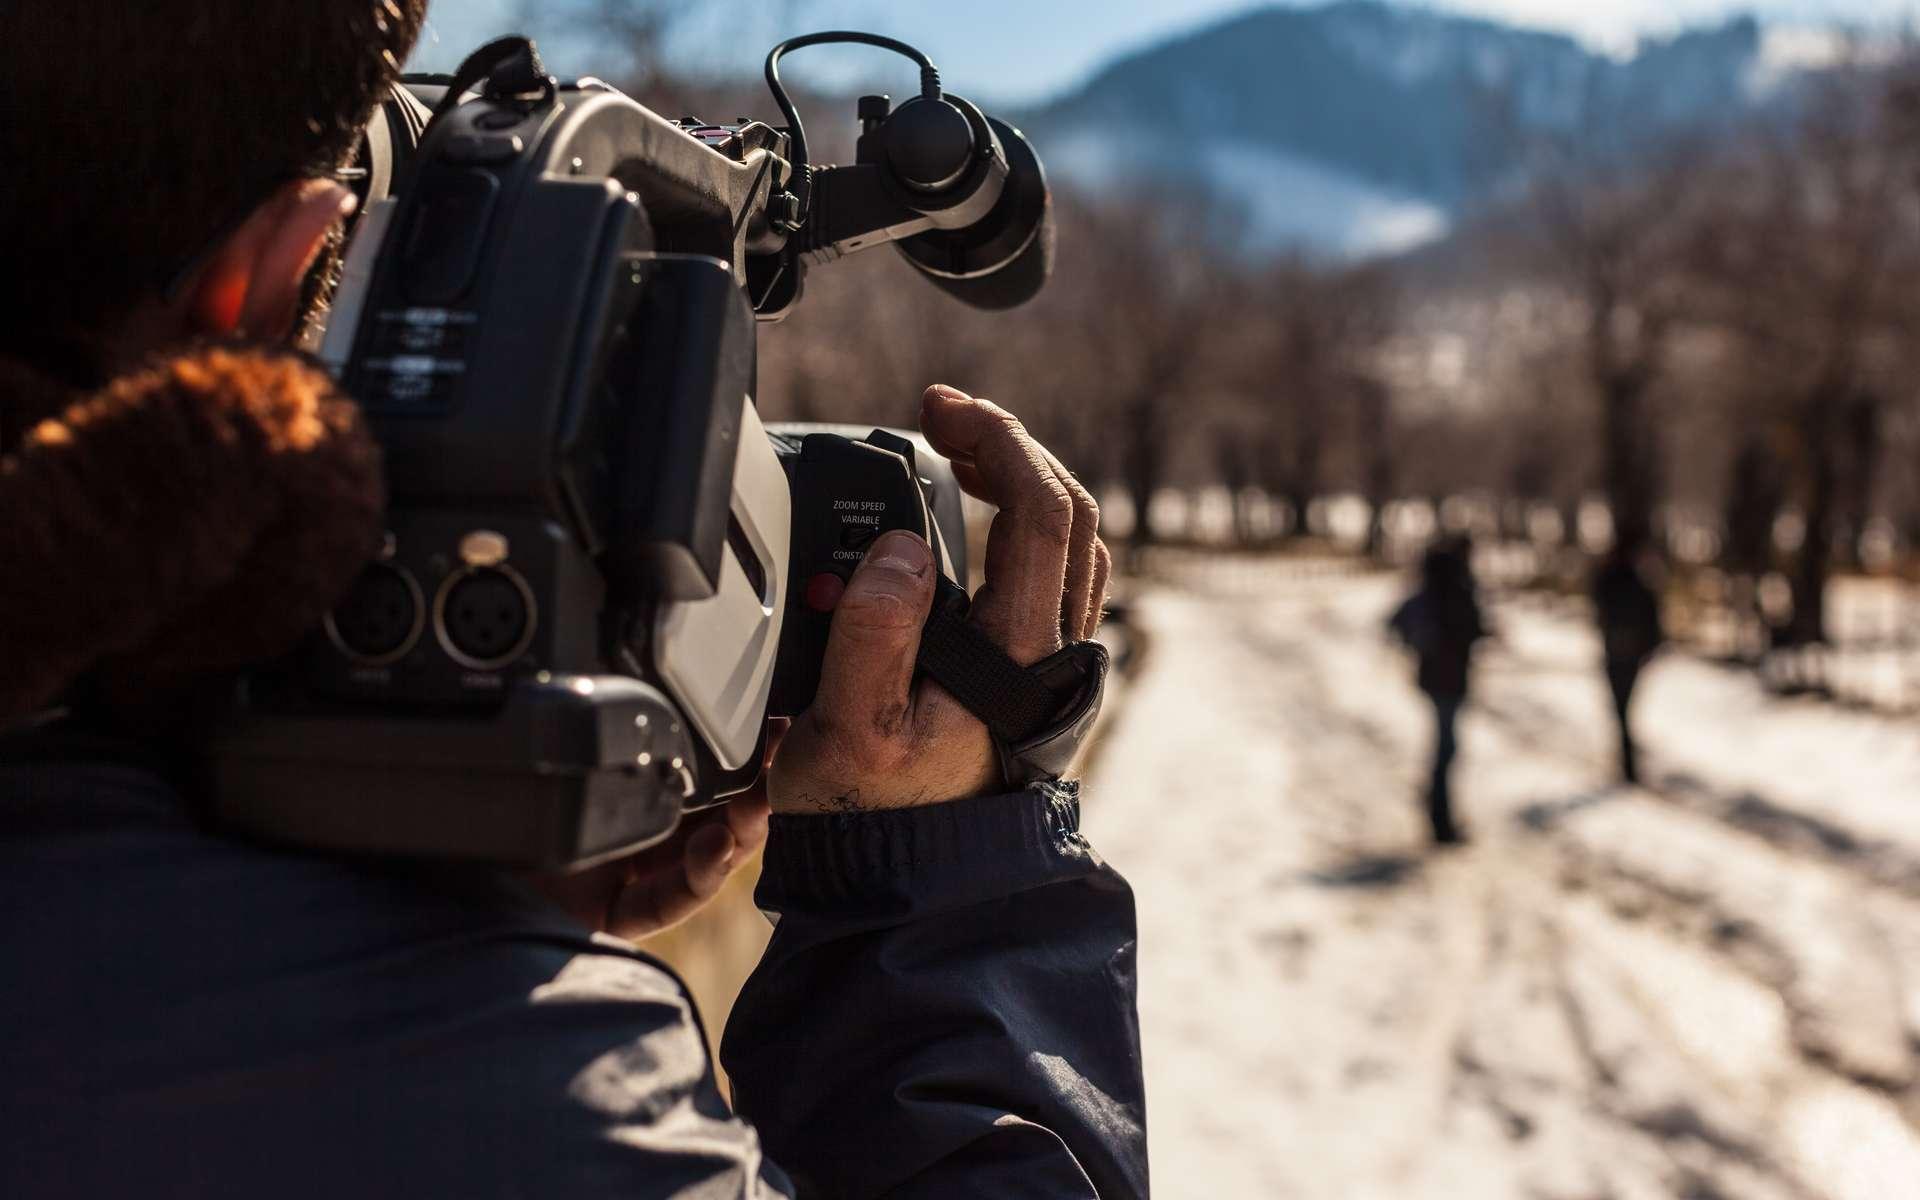 Les meilleurs documentaires sur Amazon Prime Video. © Dario Lo Presti, Adobe Stock